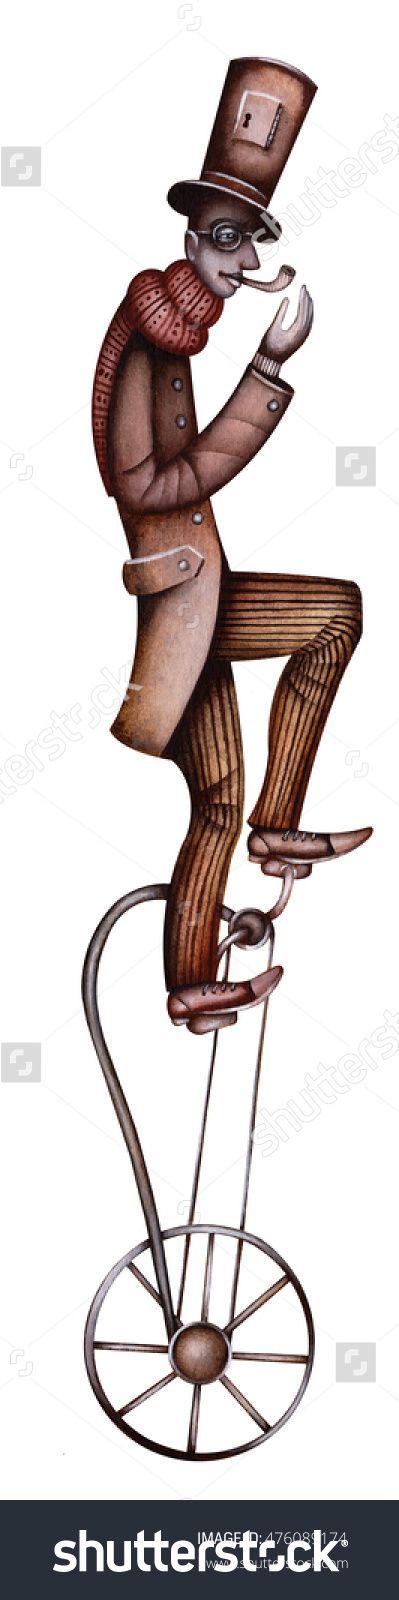 Circus Actor by Eugene Ivanov #cirque #circus #clown #clownery #illustration #eugeneivanov #@eugene_1_ivanov